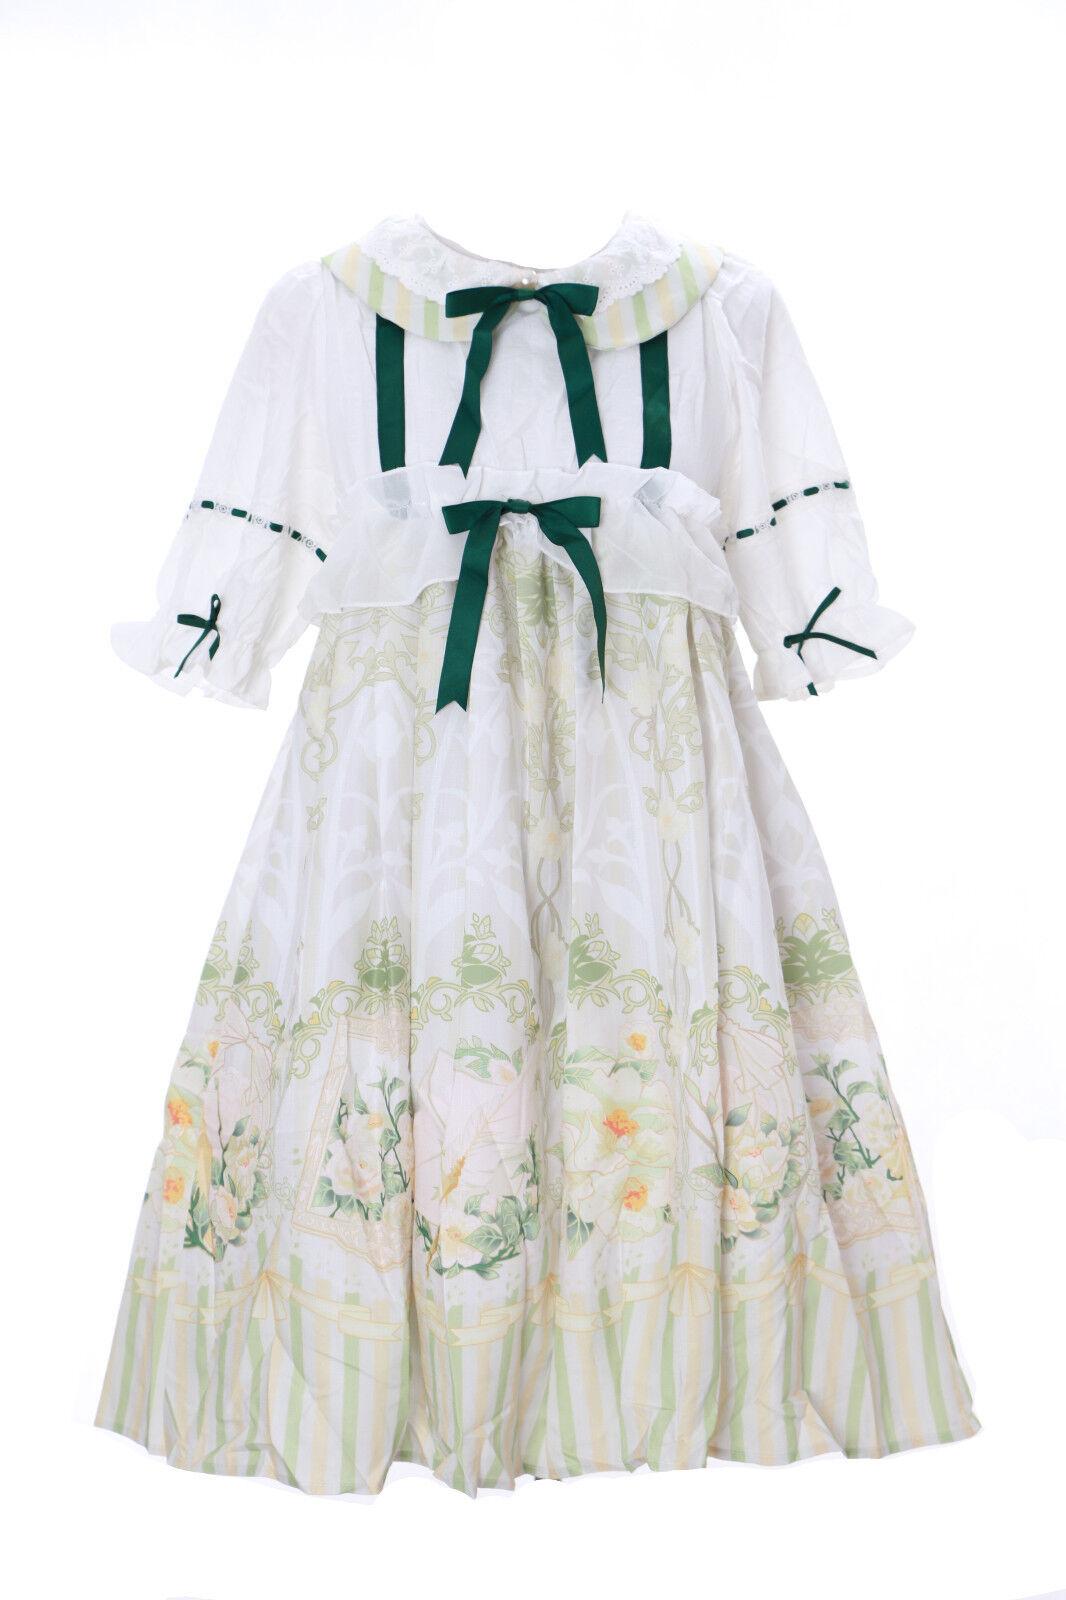 JSK-12 Oiseau Vert Blanc Vintage  -Doll Mignon Pastel Gothique Lolita Cosplay